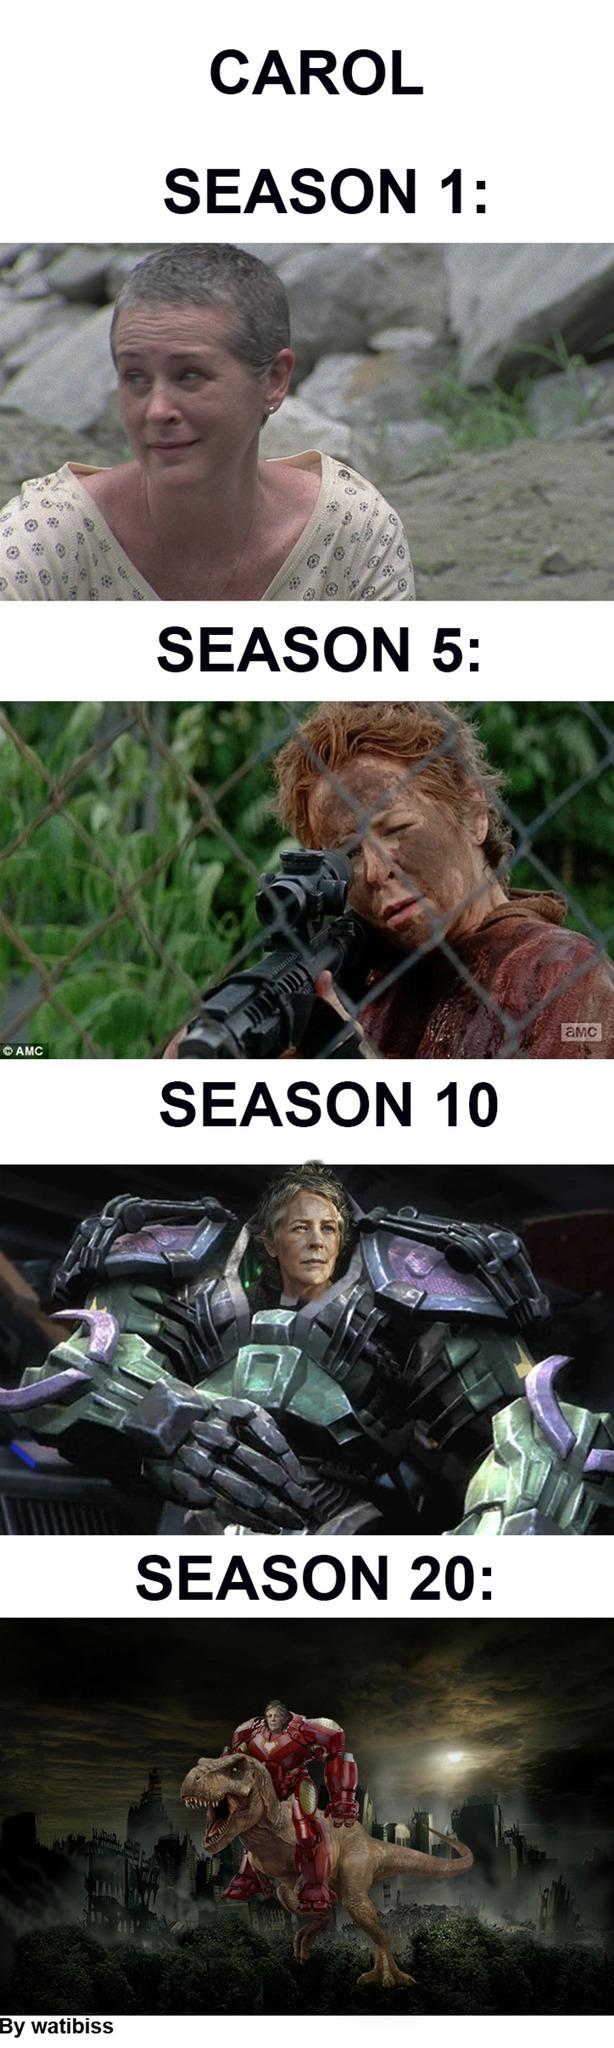 Carol is more badass than expected - meme